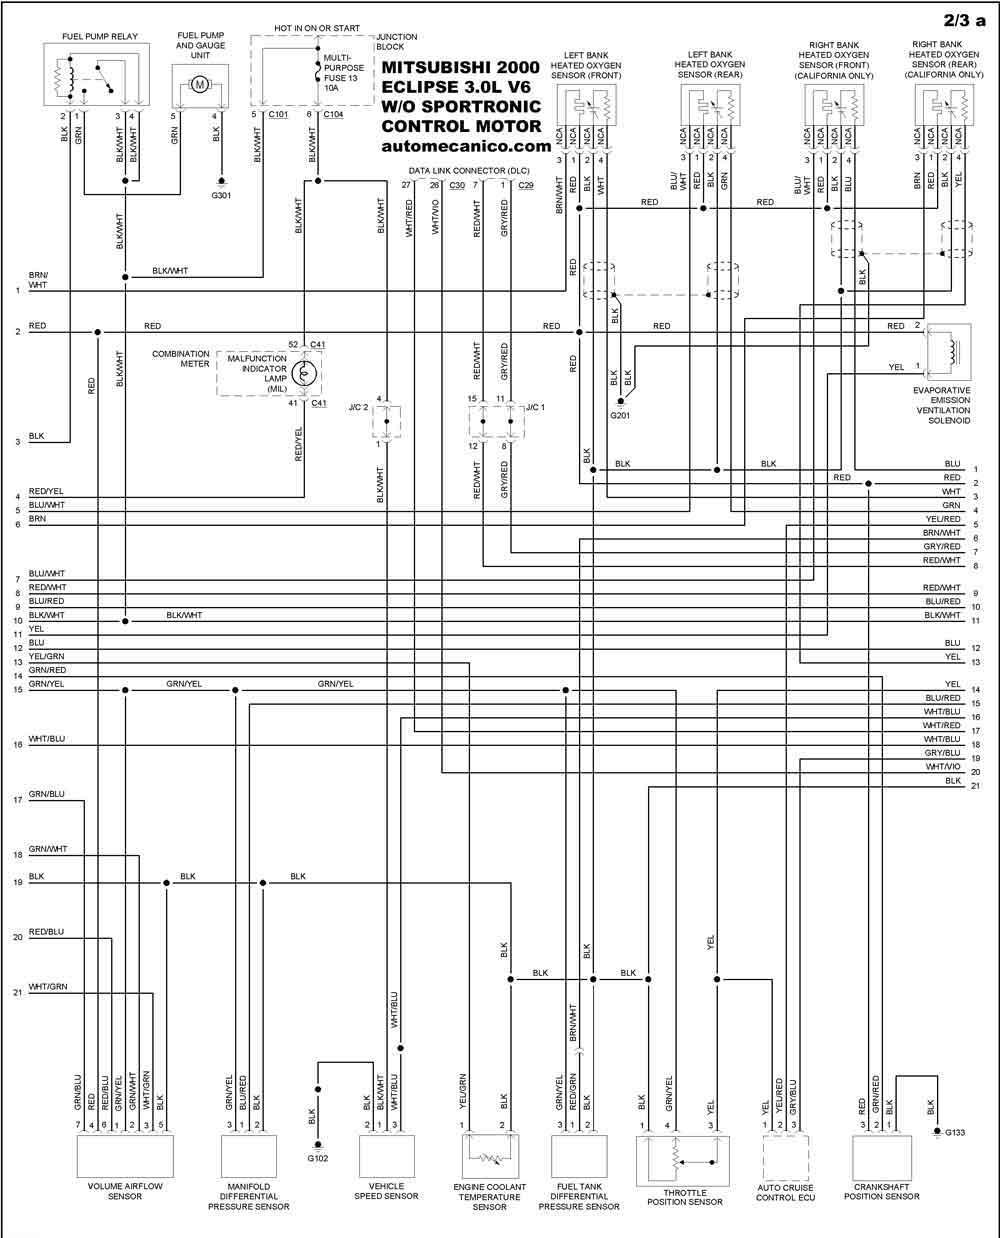 mitsubishi 2000 - diagramas control del motor - graphics - esquemas